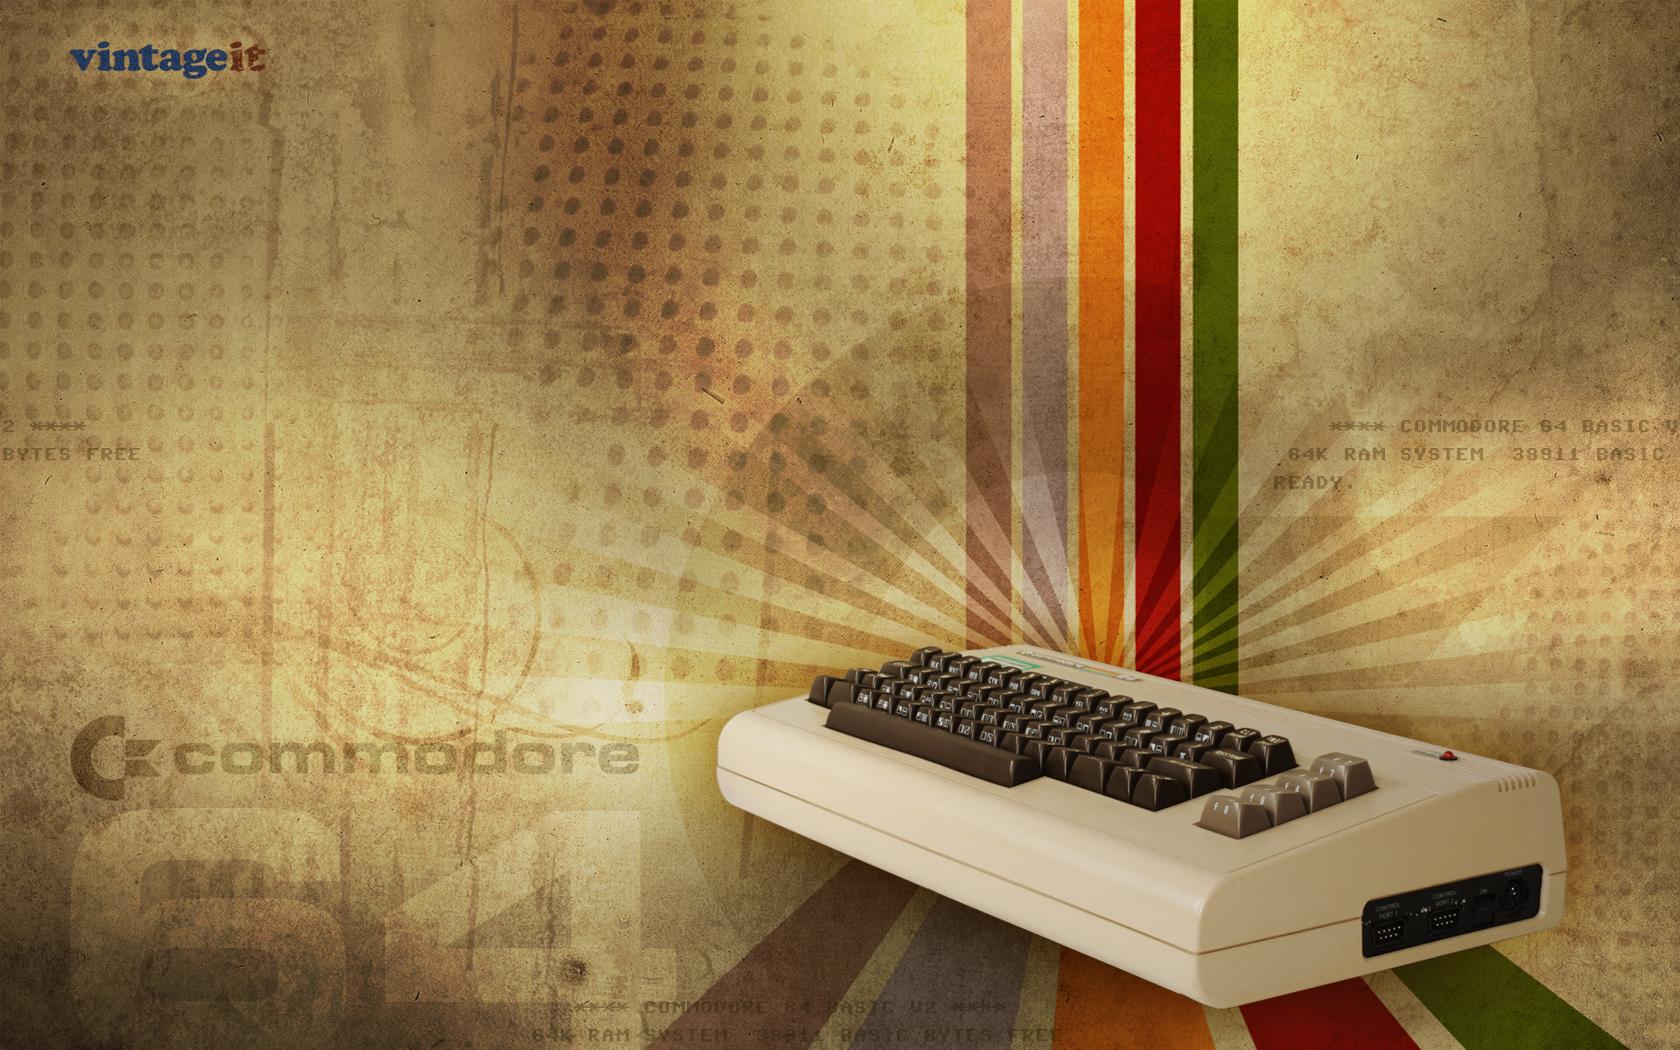 Commodore 64 vintage wallpaper   Desktop HD iPad iPhone 1680x1050